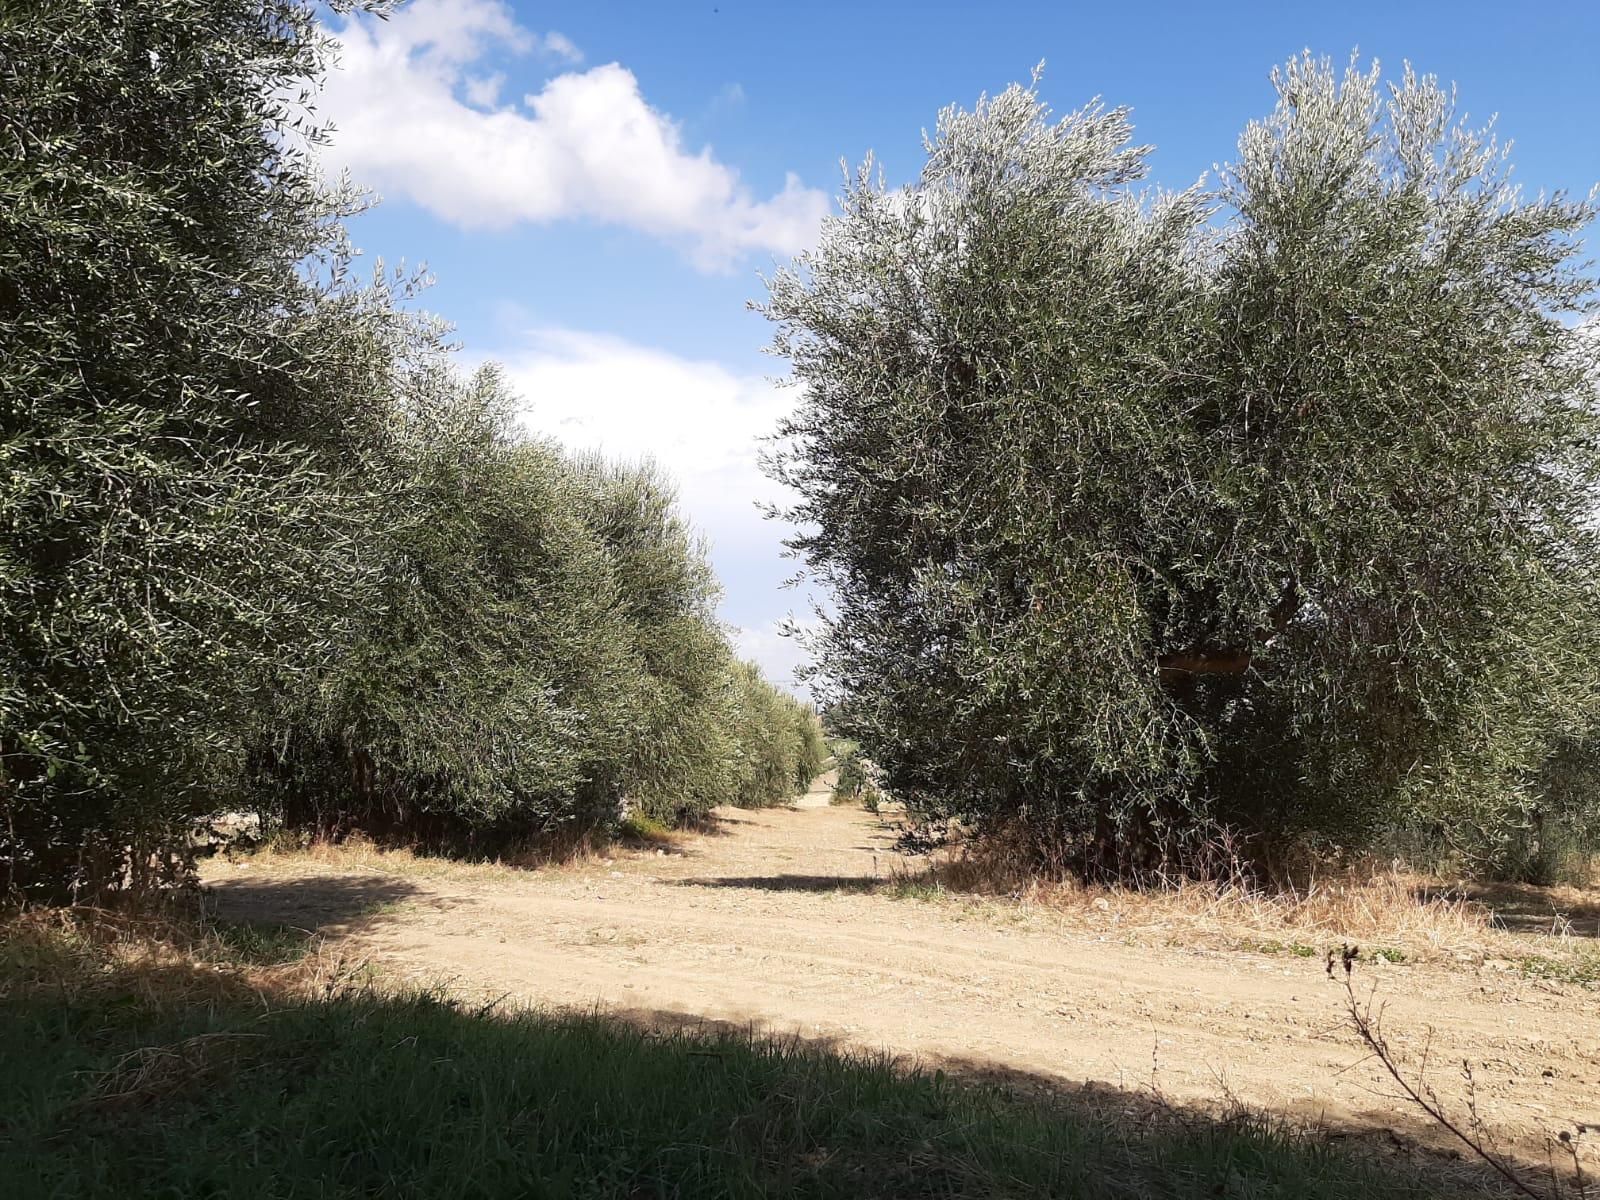 http://www.olivekiara.com/20190906_175621.JPG